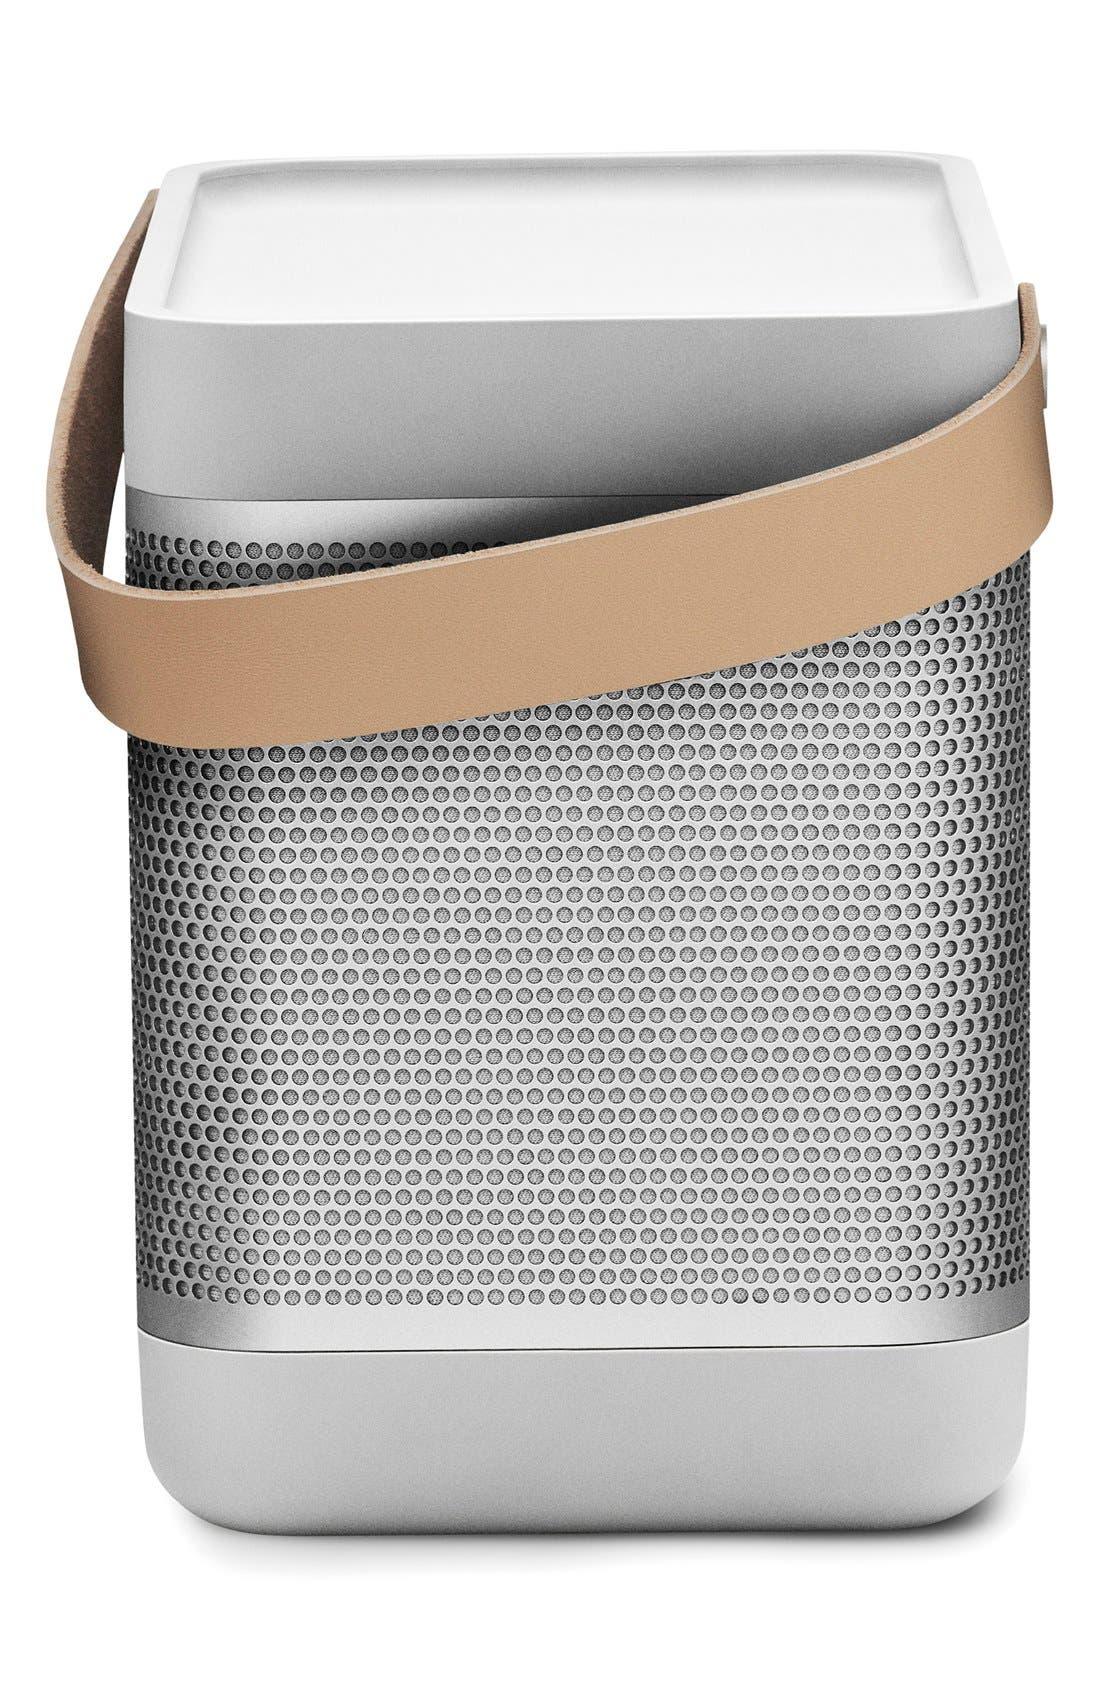 'Beolit 15' Portable Bluetooth<sup>®</sup> Speaker,                             Alternate thumbnail 5, color,                             040